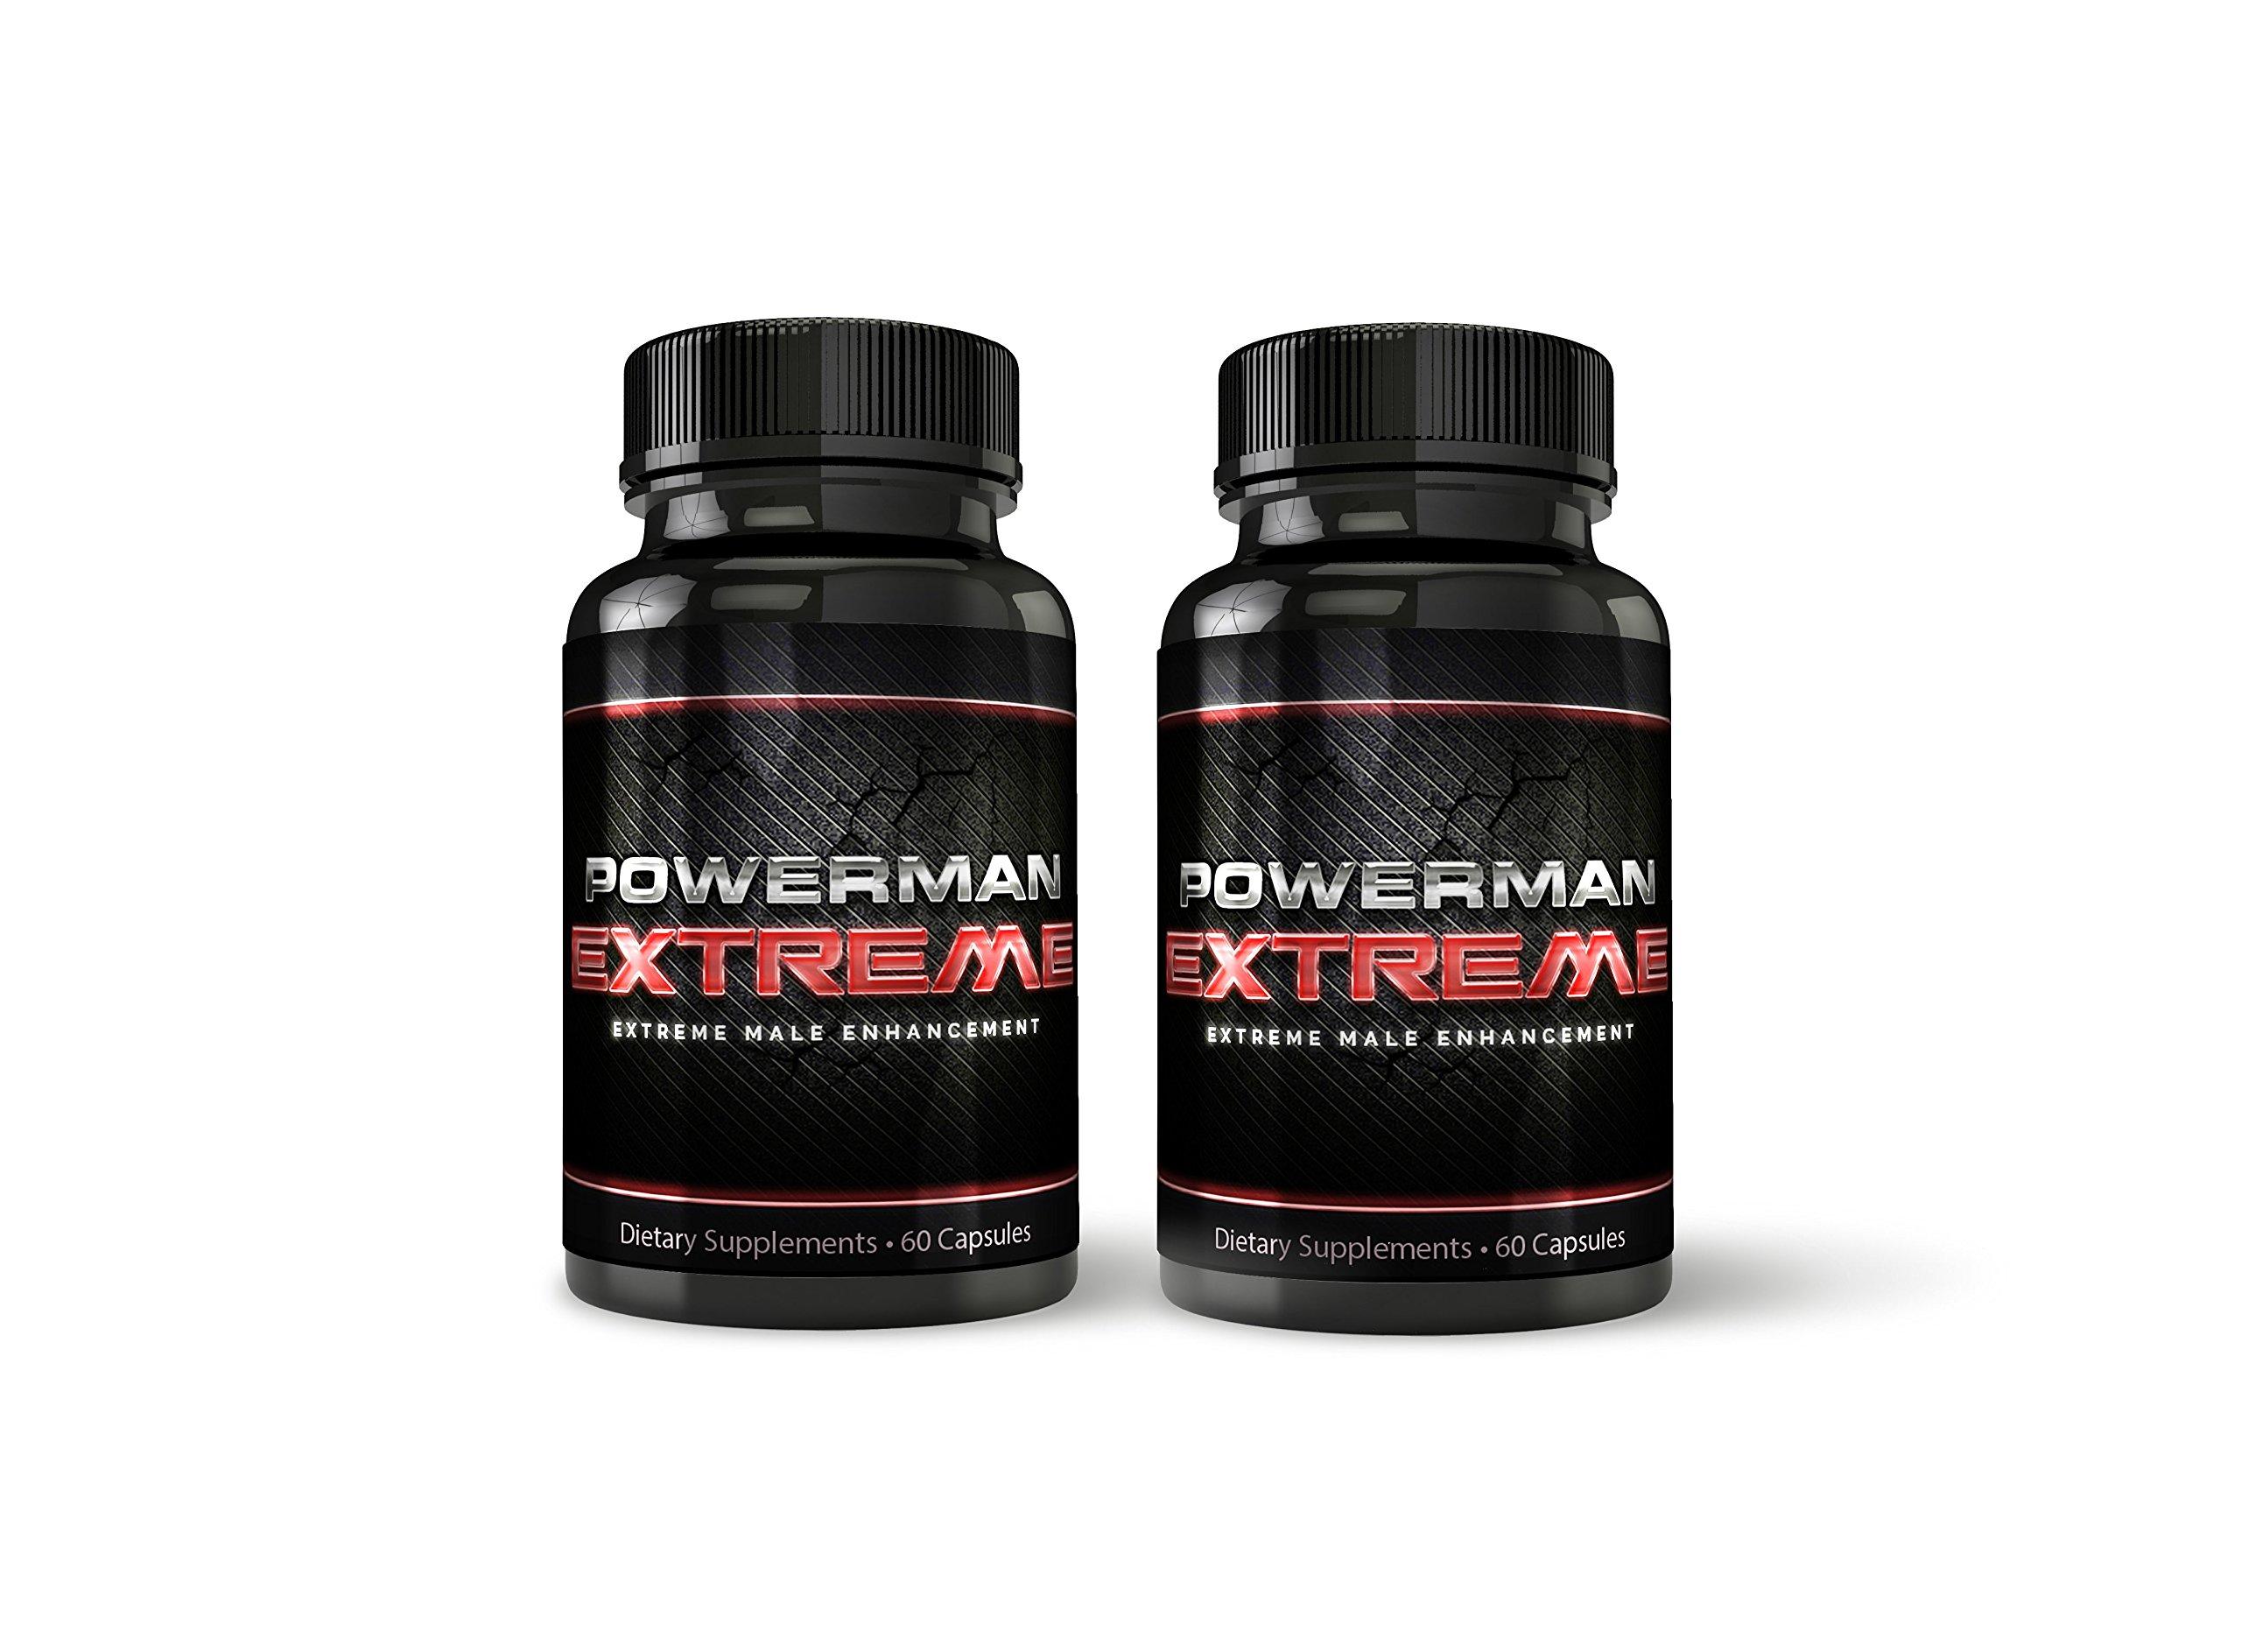 Powerman Extreme Male Enhancement - 2-Month Supply - Maximum Strength Size Pills - Increase Size, Stamina, Performance - Ultra-Quality Tongkat, L-Arginine, Tribulus Terrestris - Boost Testosterone